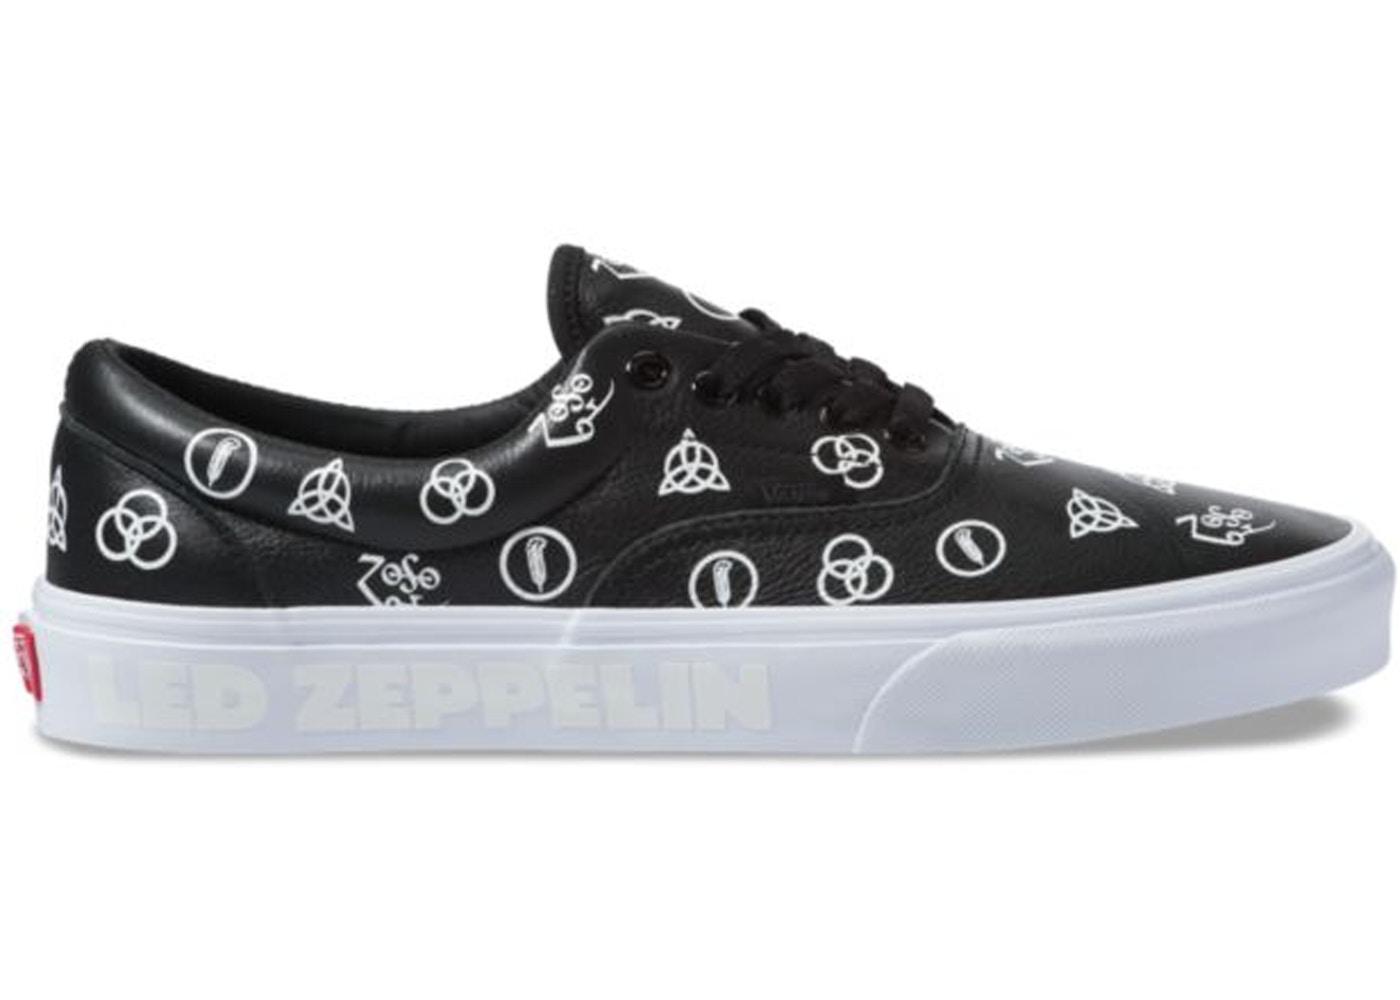 ed877b7e04 Vans Footwear - Buy Deadstock Sneakers